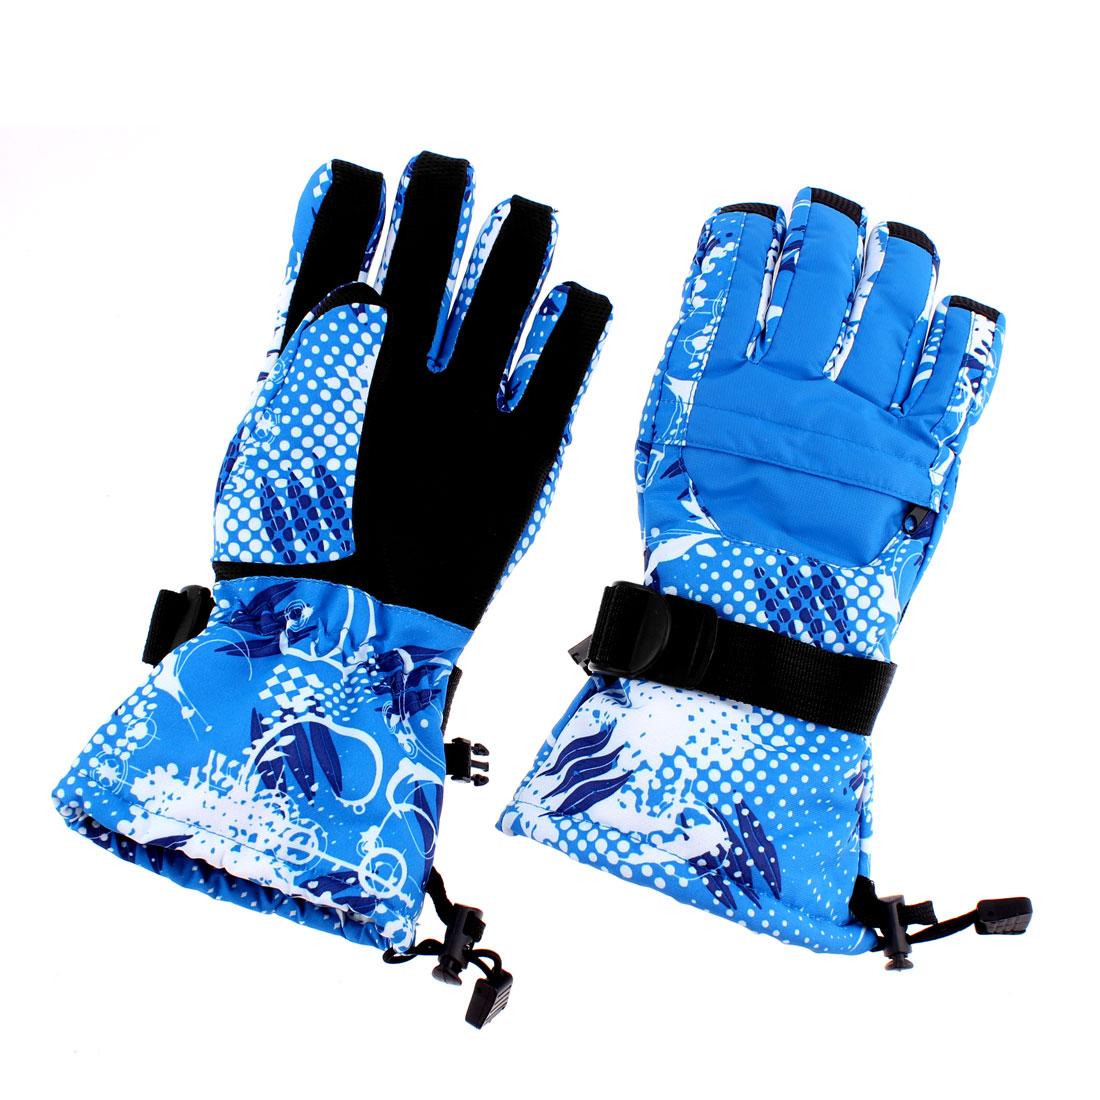 Women Winter Sports Snow Snowboard Ski Gloves Blue M Pair